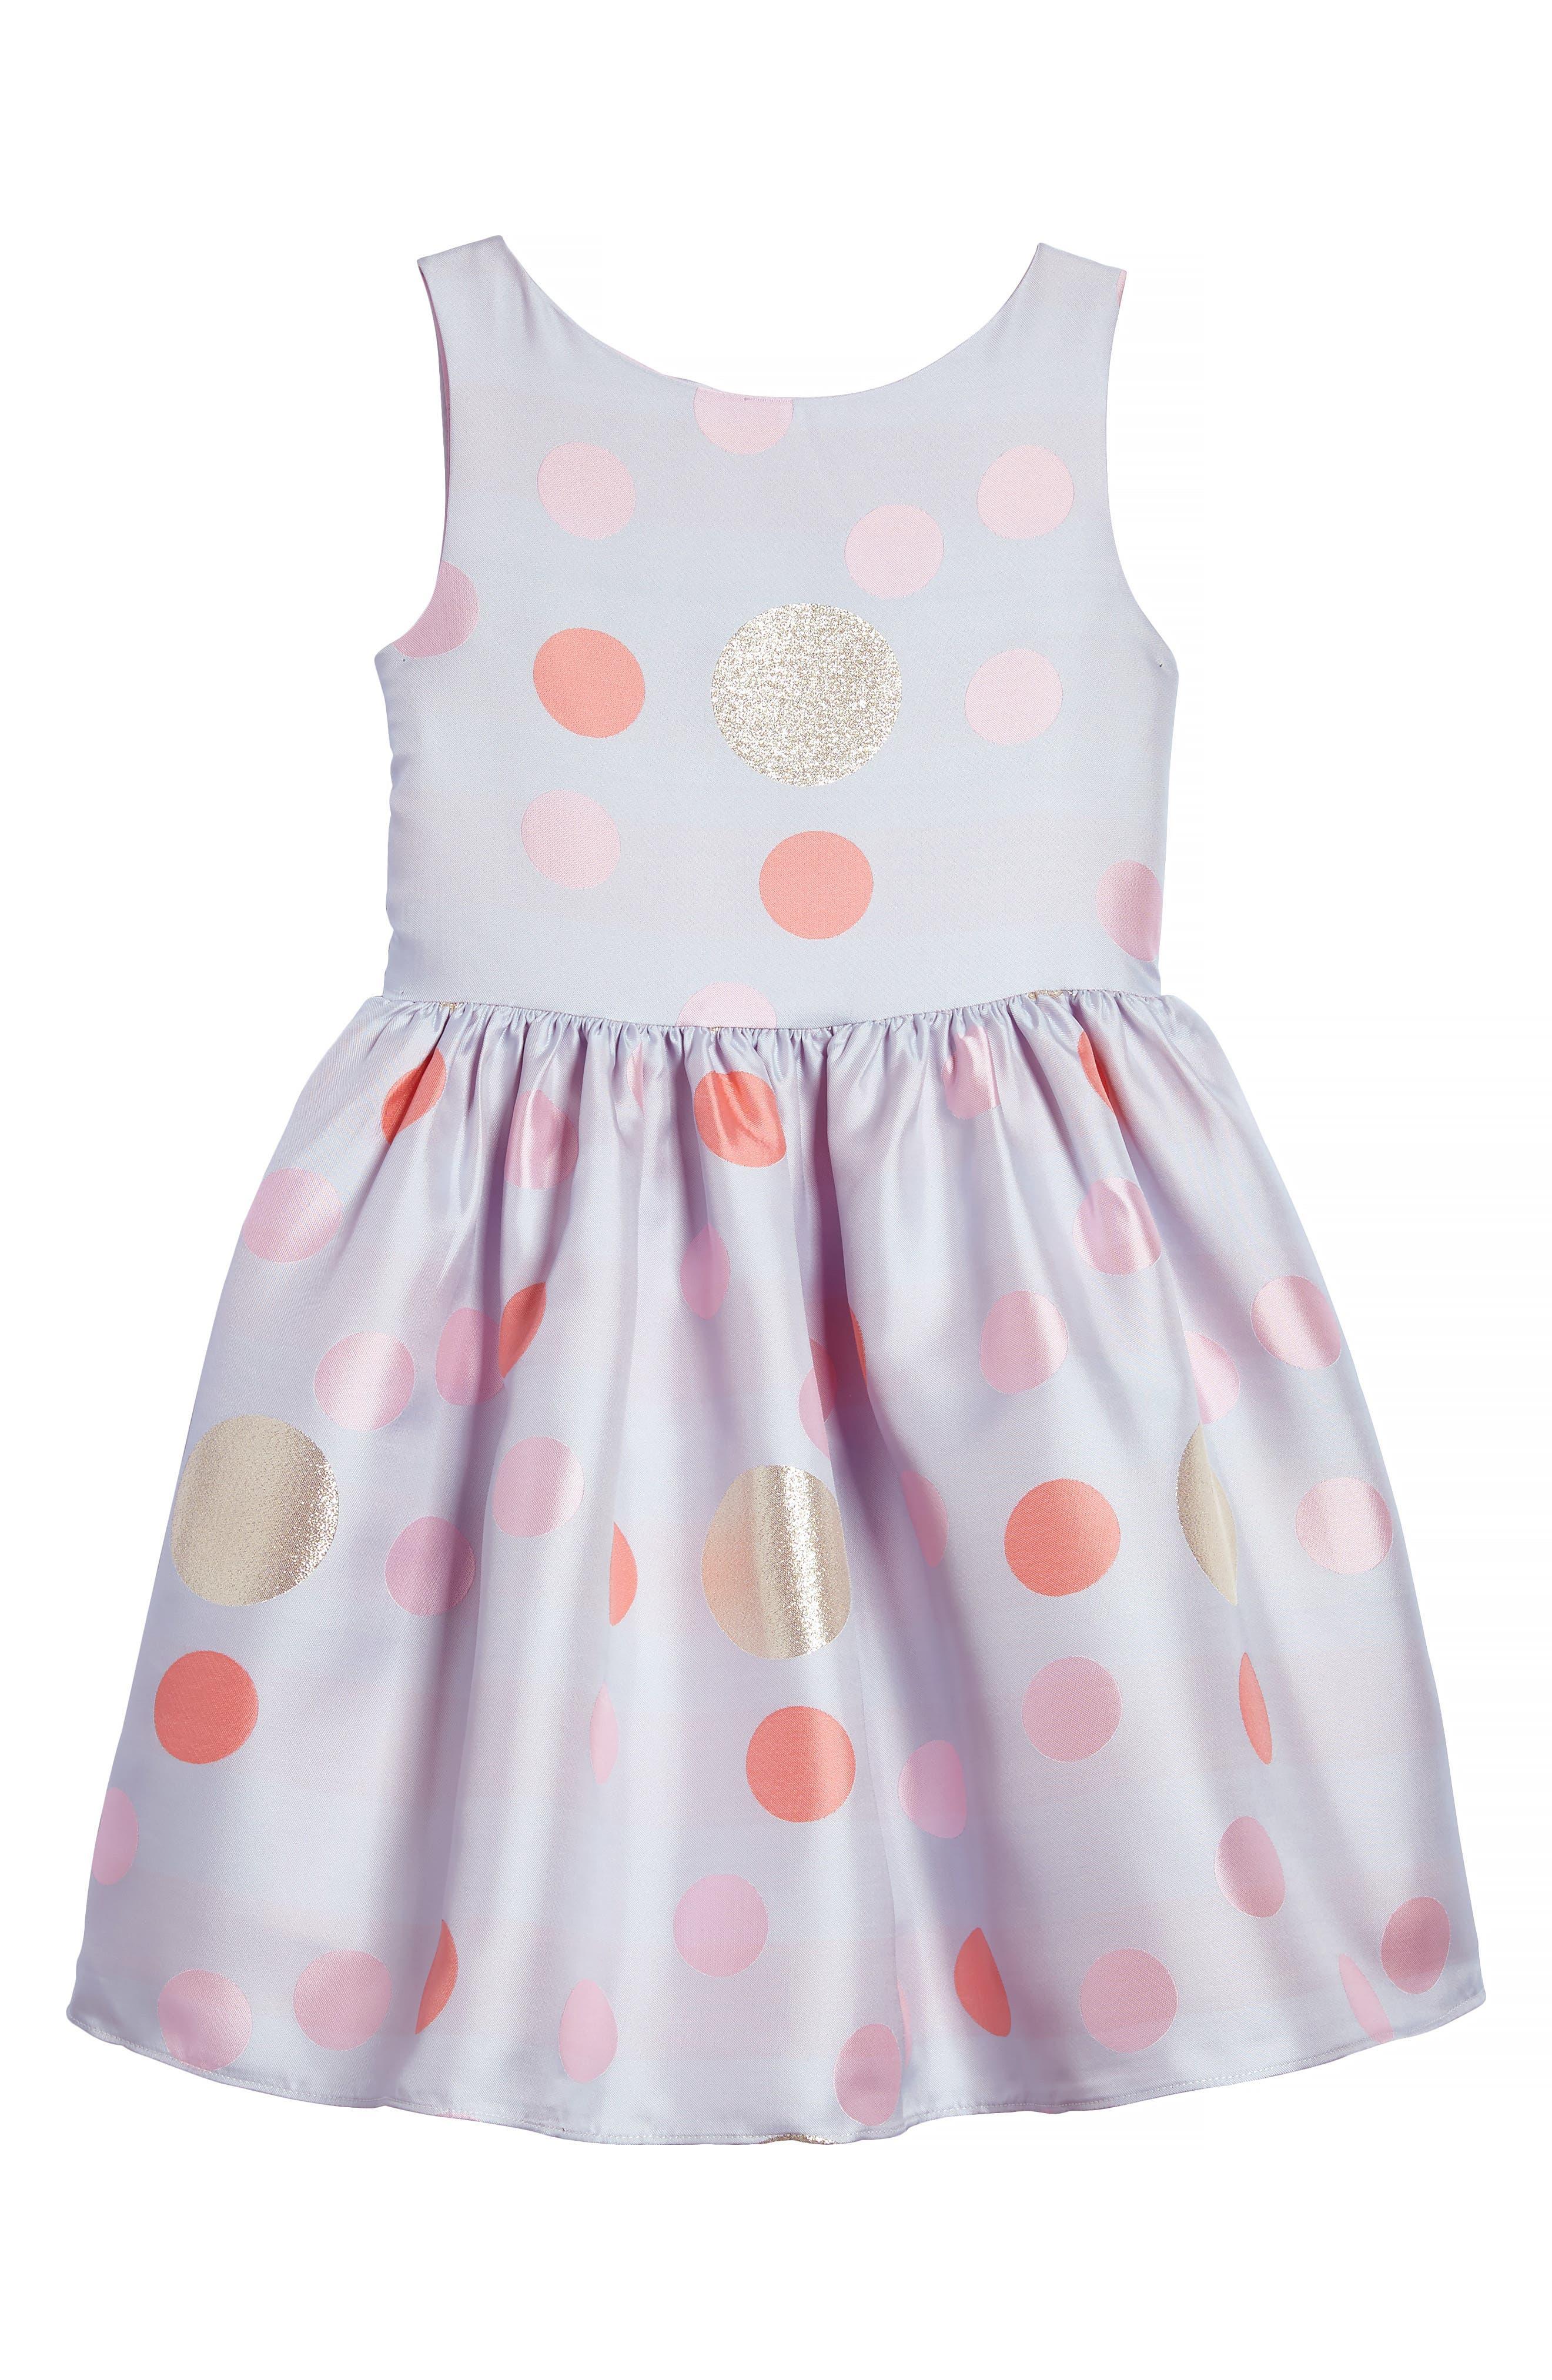 Alternate Image 1 Selected - Frais Metallic Polka Dot Dress (Toddler Girls, Little Girls & Big Girls)